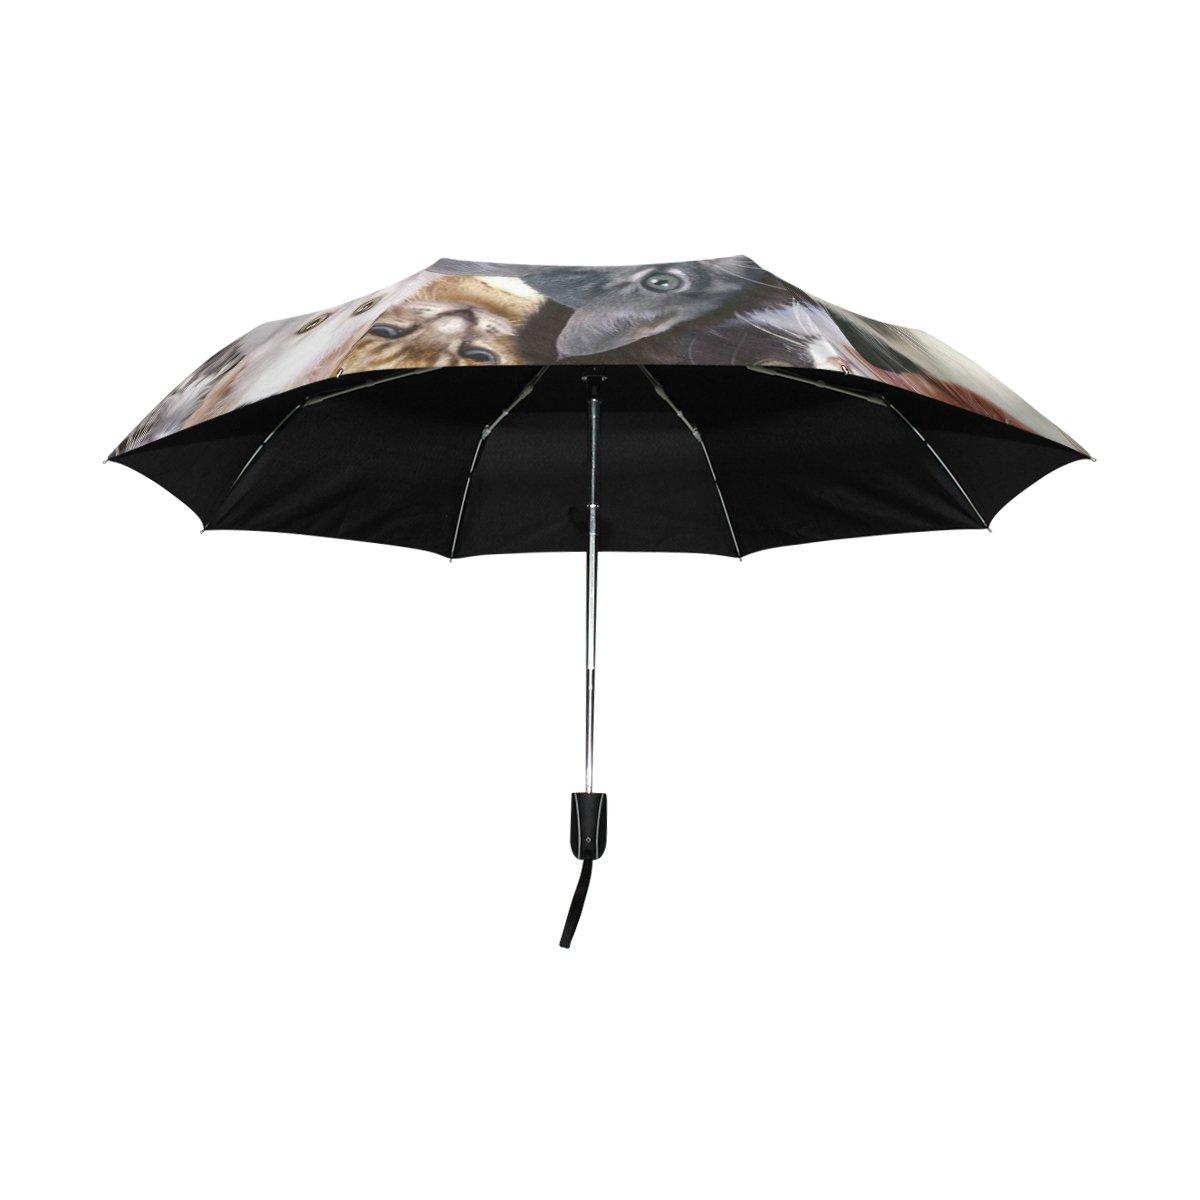 Amazon.com: JSTEL Cat Windproof UV Umbrellas Auto Open Close 3 Folding Golf Strong Durable Compact Travel Sun Umbrella, Portable Lightweight Easy Carrying: ...